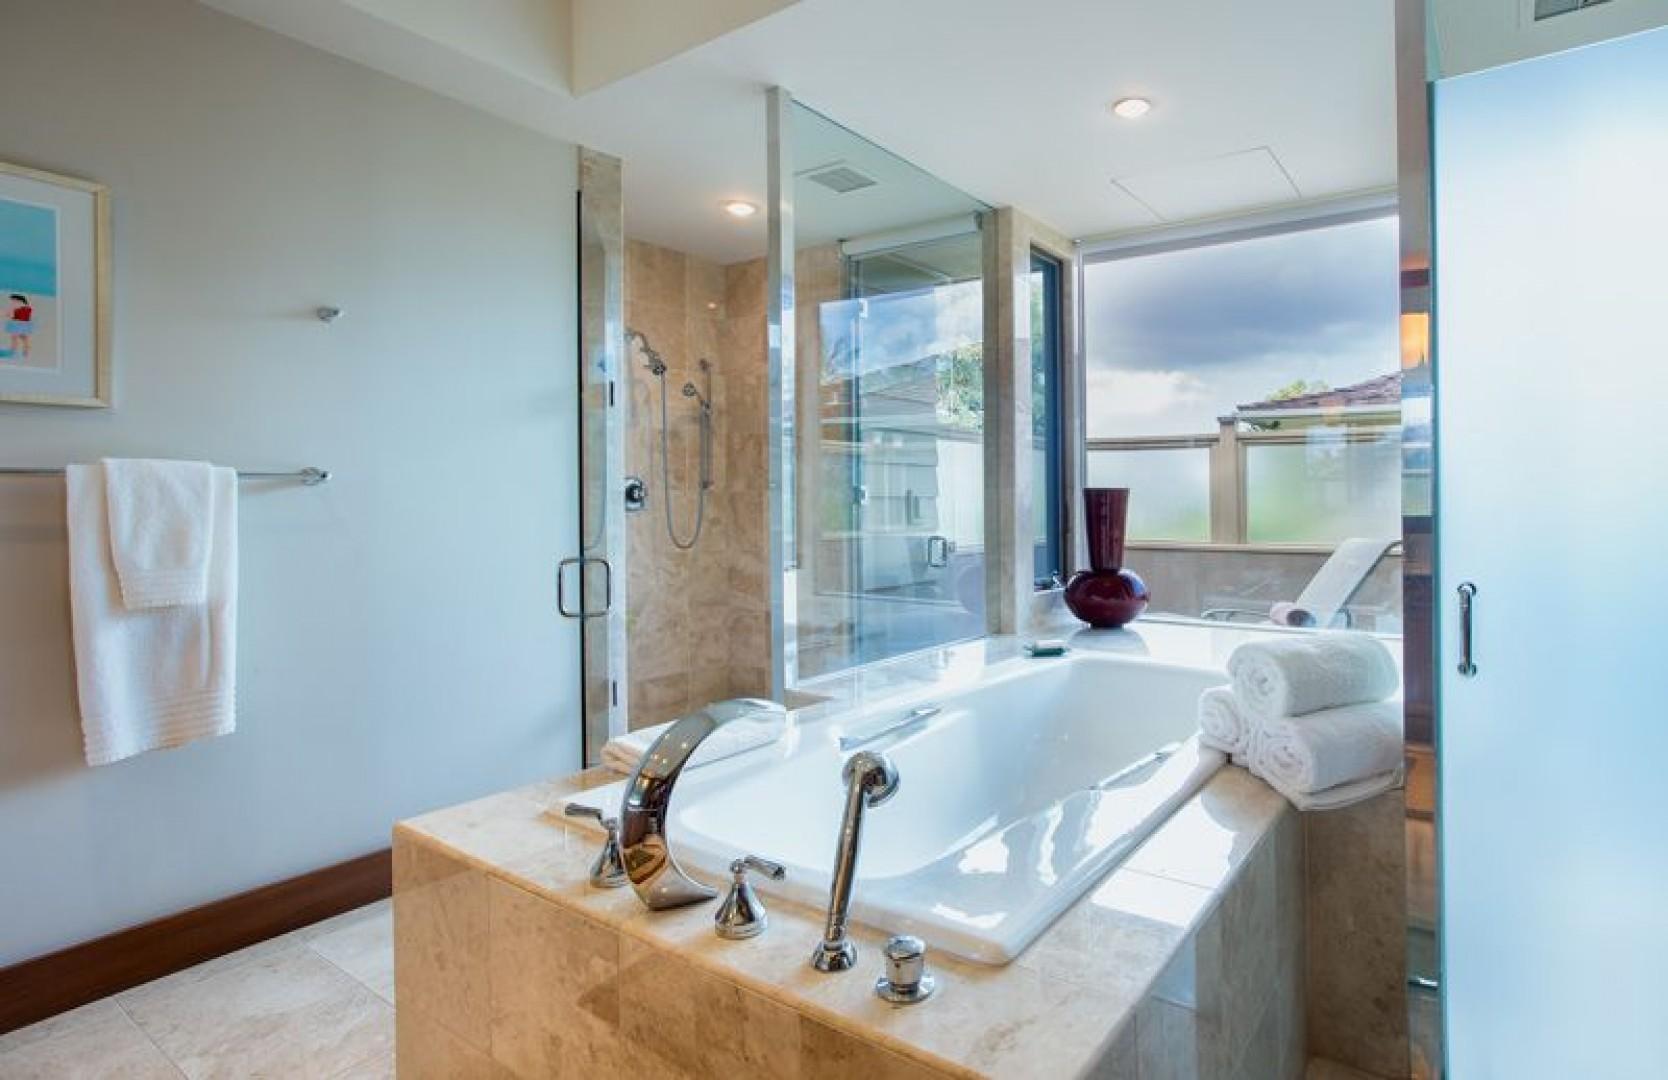 Master Bath has a soaking tub and walk in shower